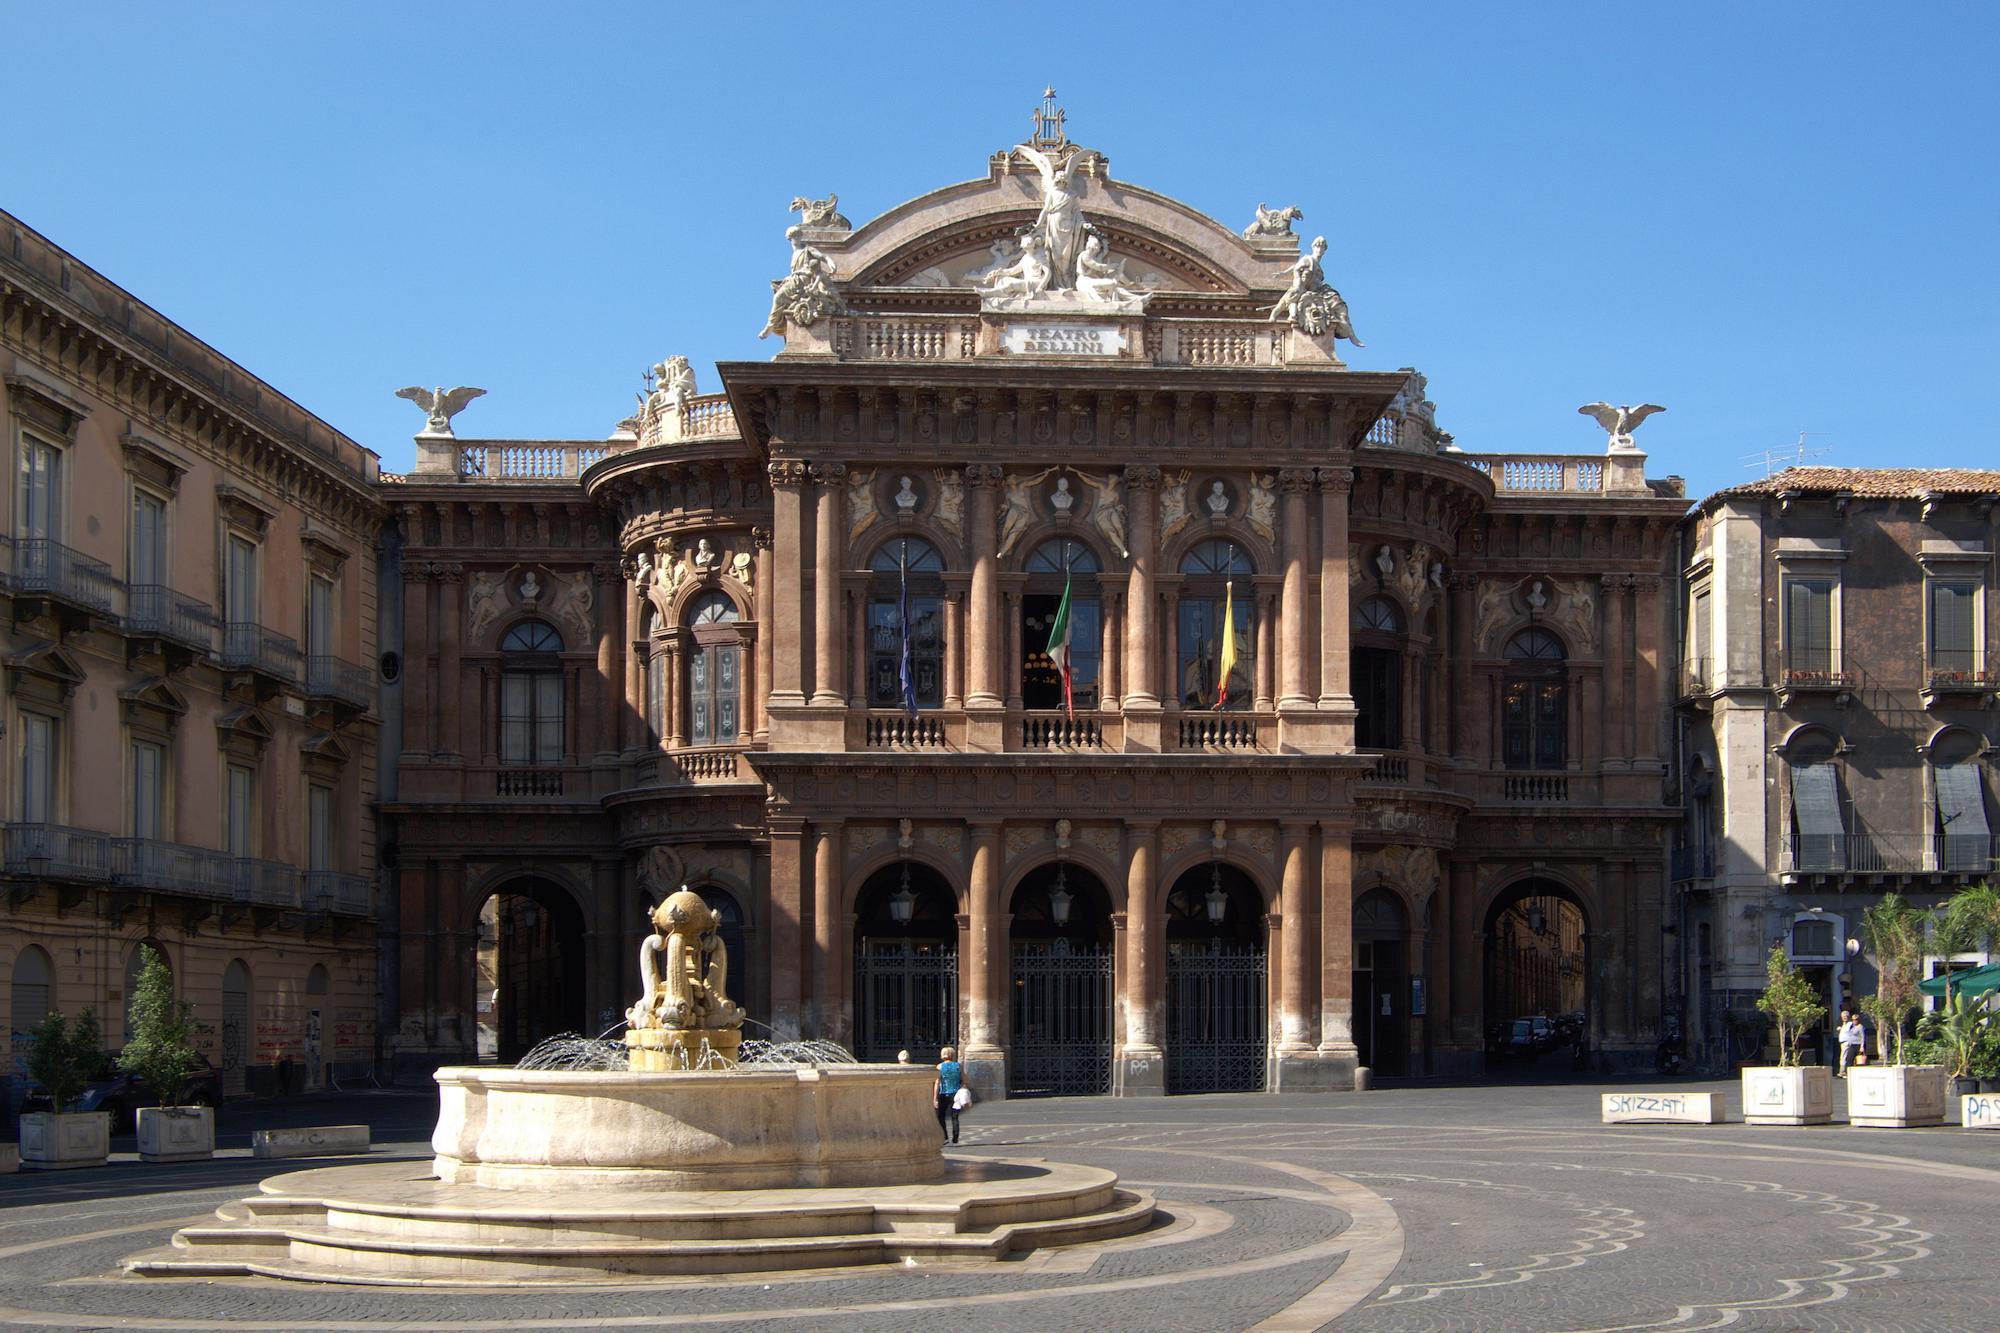 {{de|Italien, Sizilien, Catania, Teatro Bellini}} {{en|Italy, Sicily, Catanaia,  Teatro Bellini}}